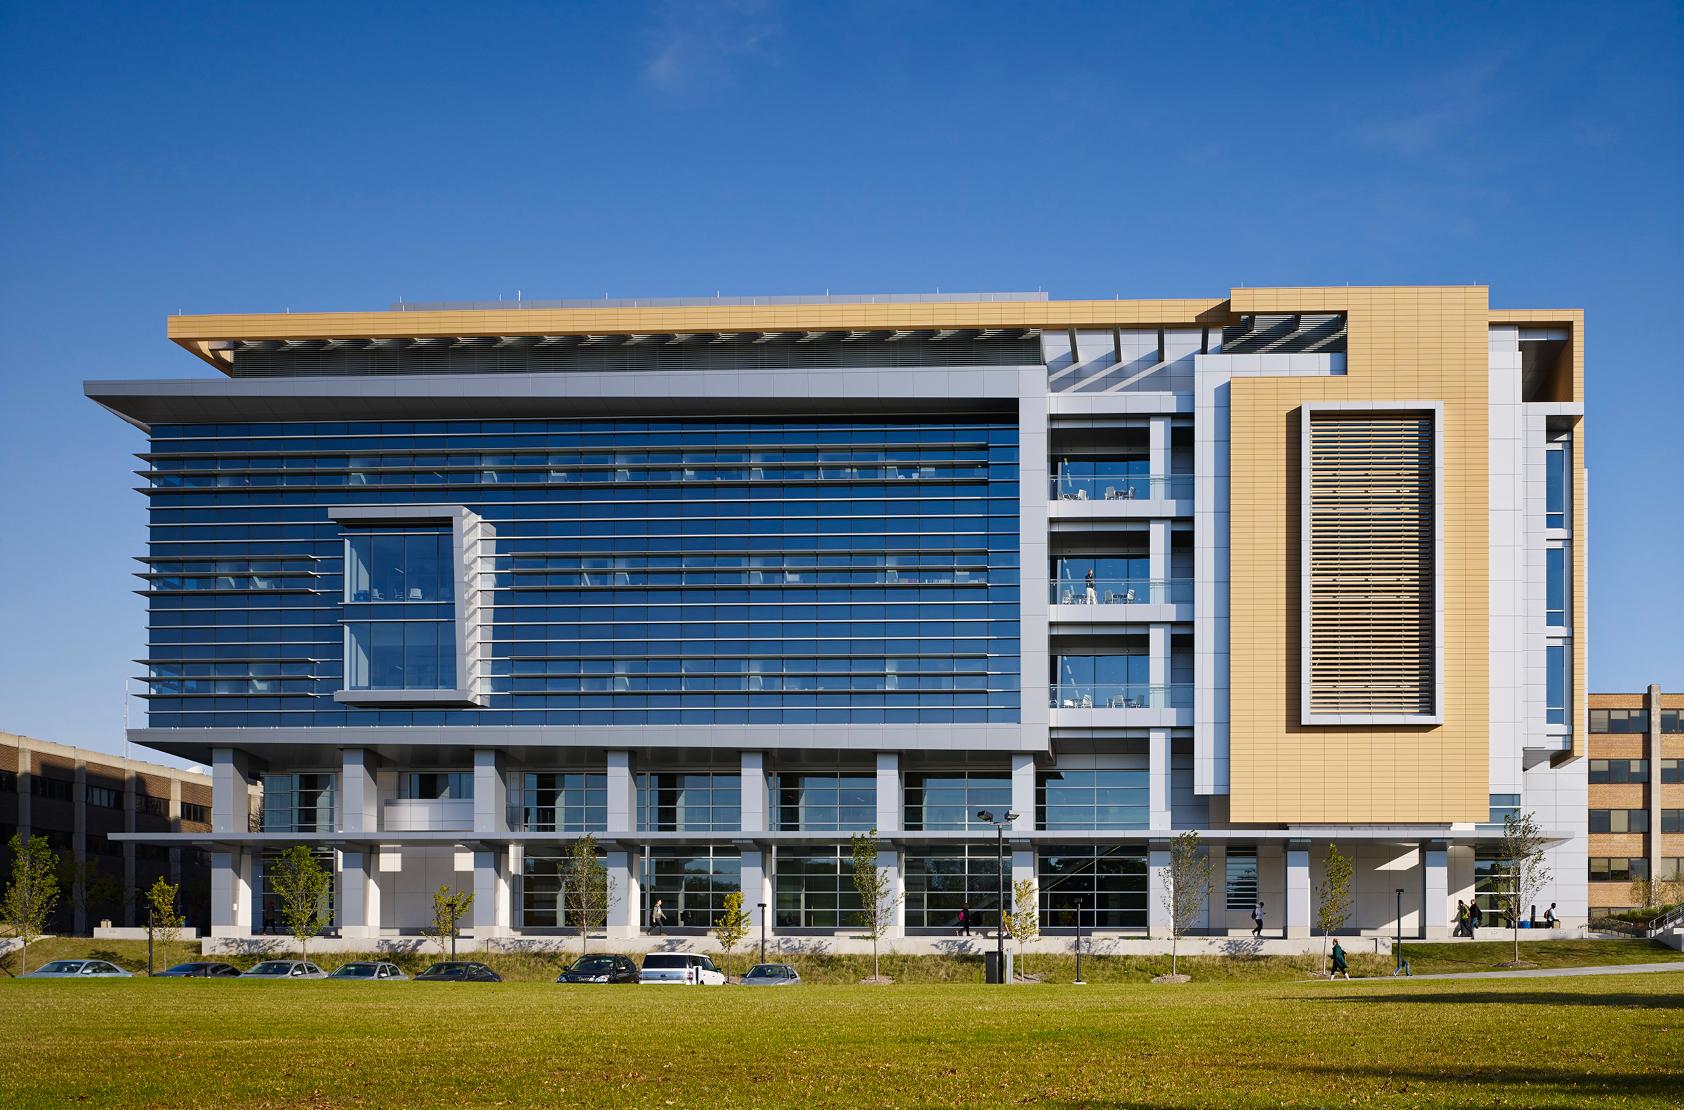 University of Wisconsin - Milwaukee - Kenwood Interdisciplinary Research Complex